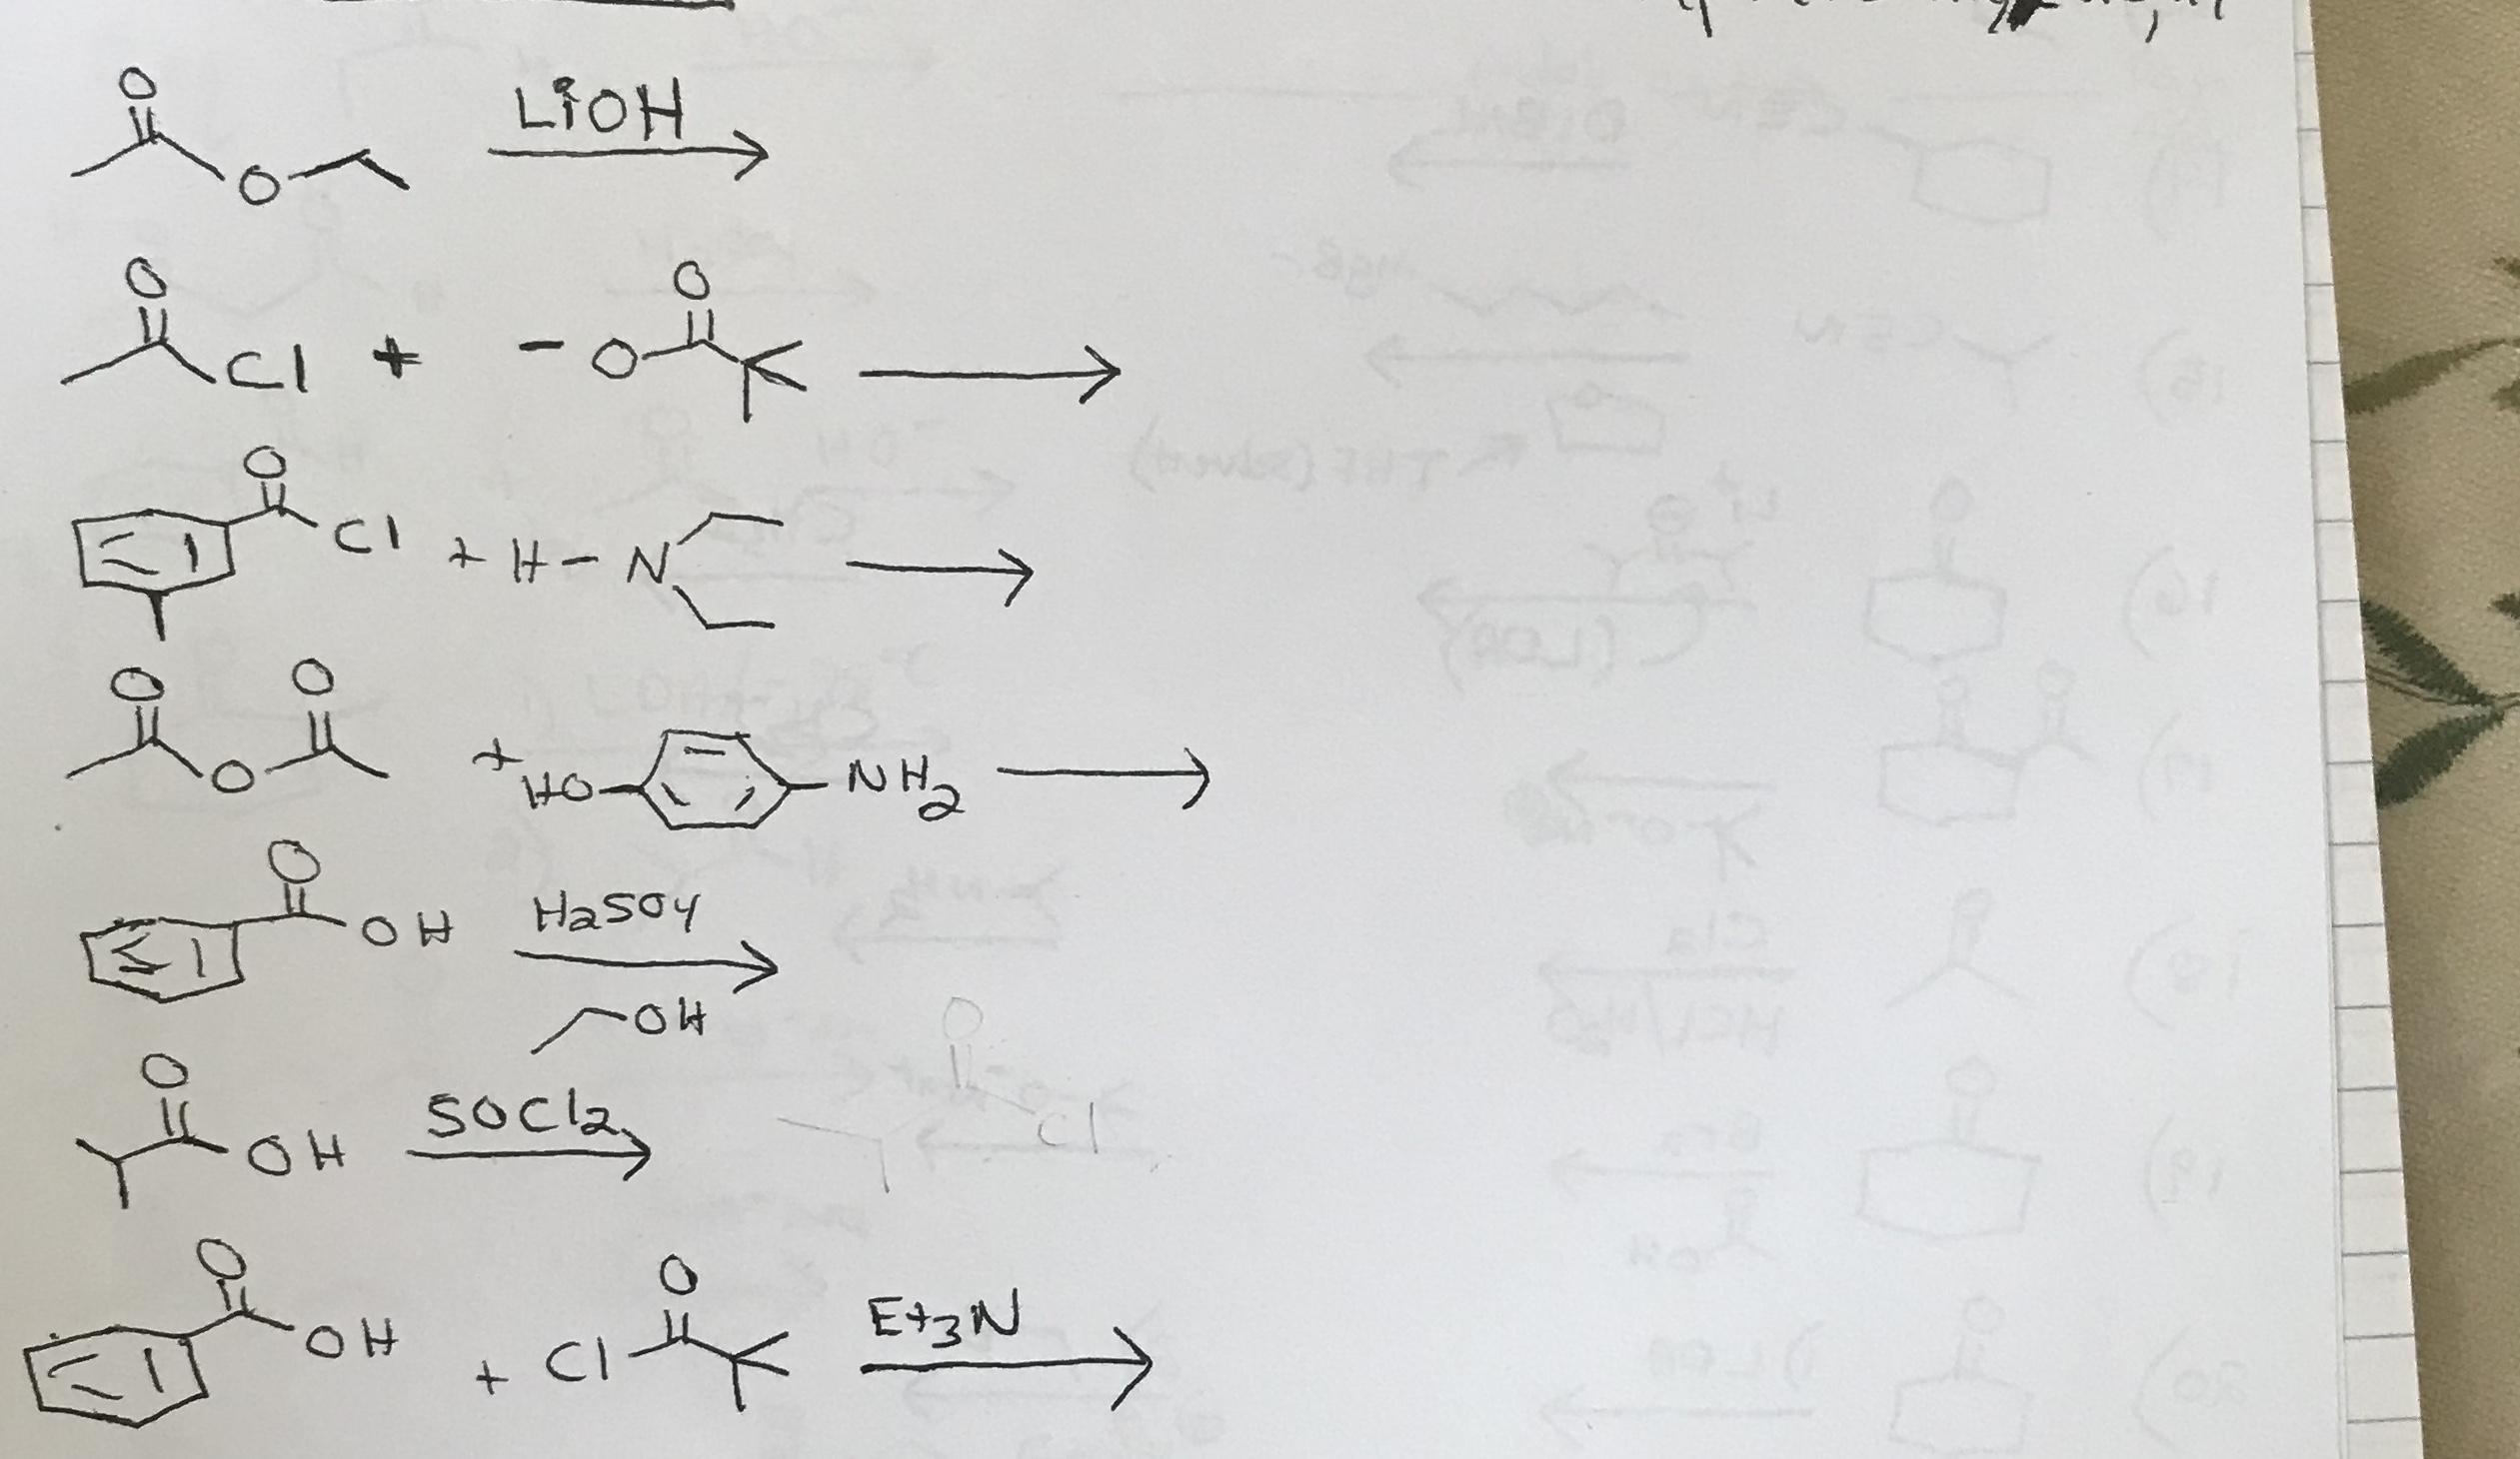 } LIOH -Cl tN NO Hasoy socla E13N CI